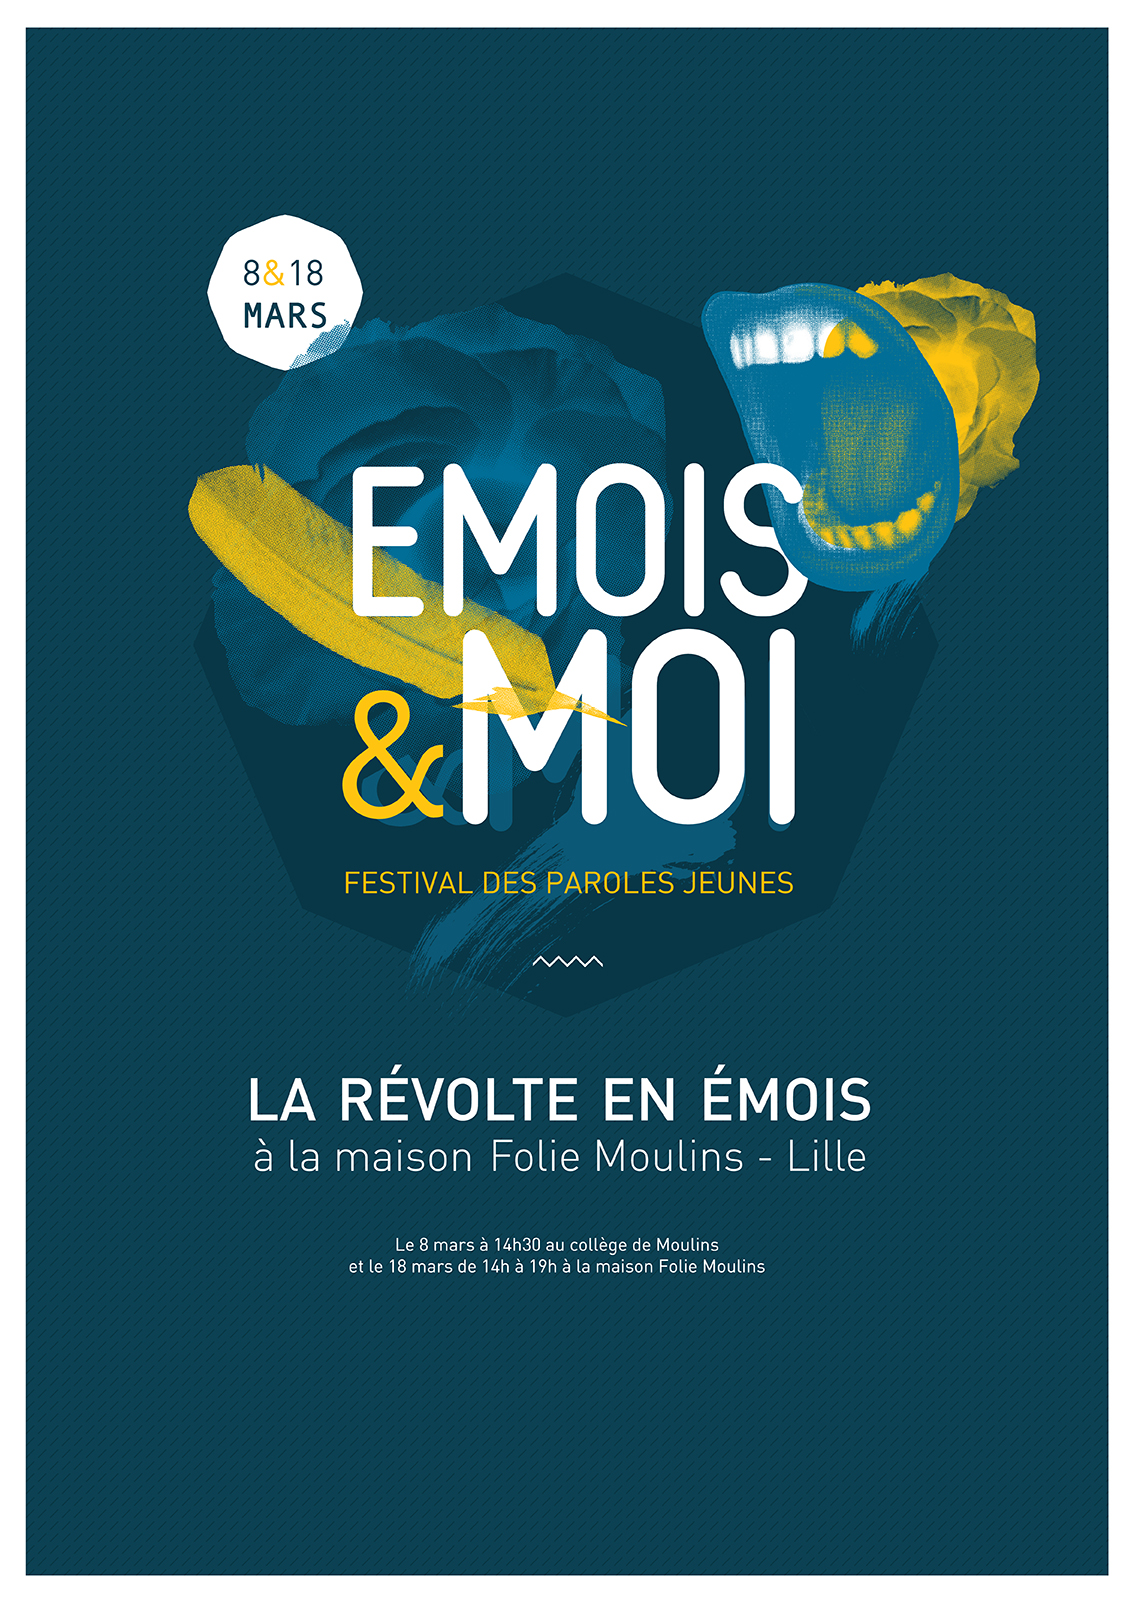 EMOIS-revolte